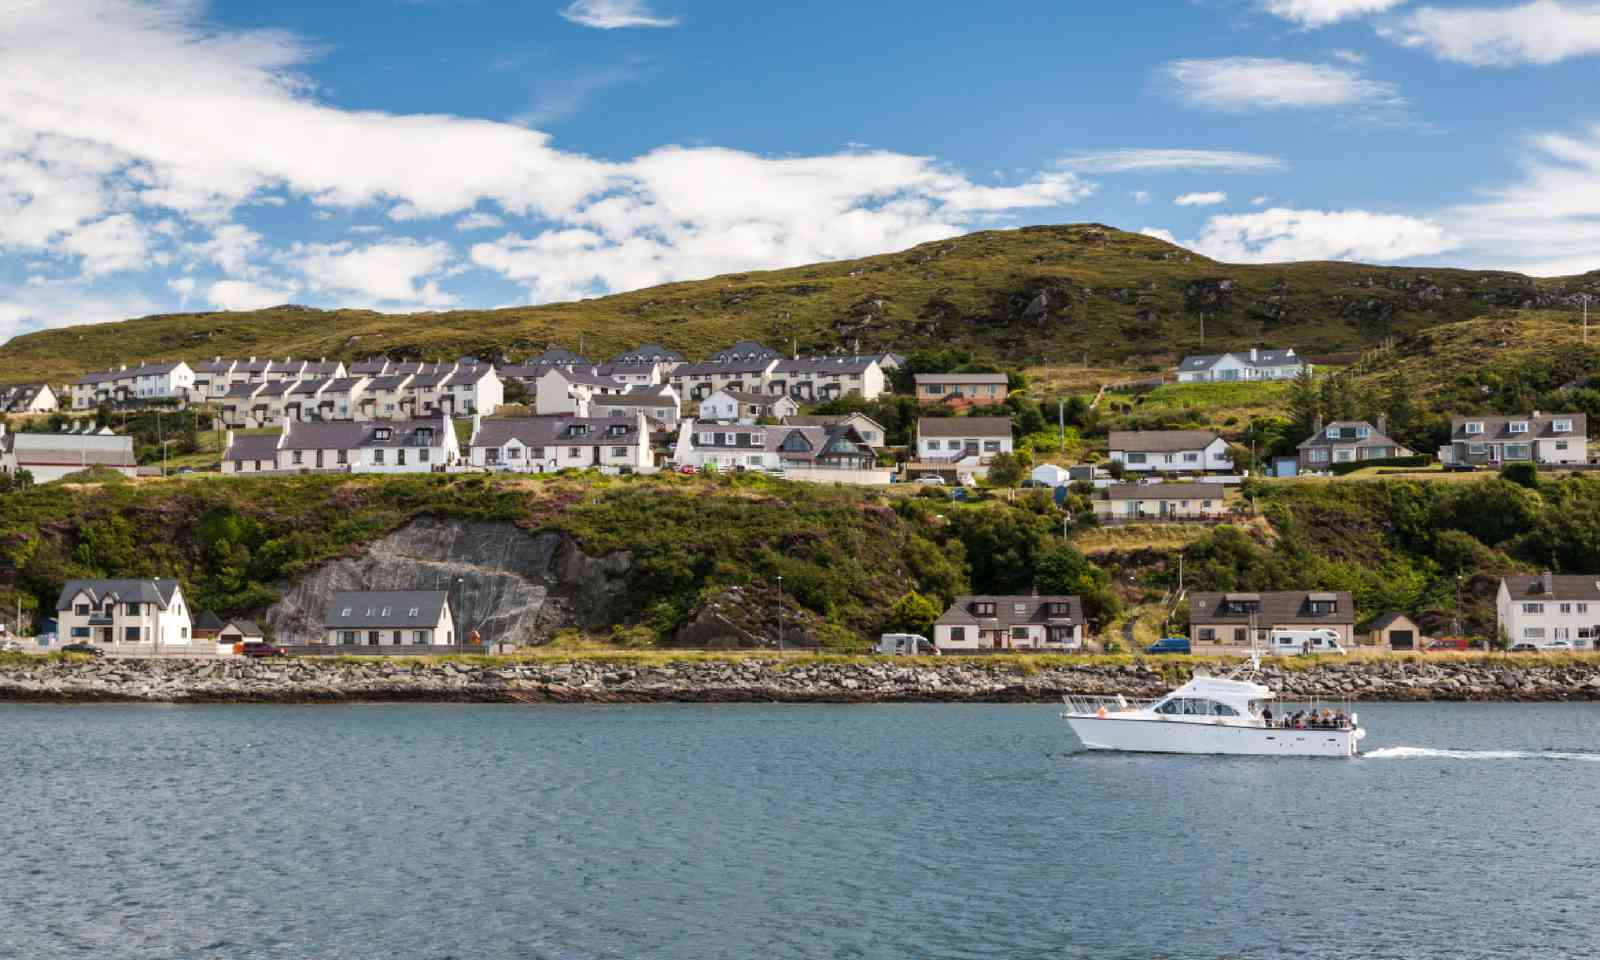 Mallaig, a little port in Lochaber (Shutterstock)